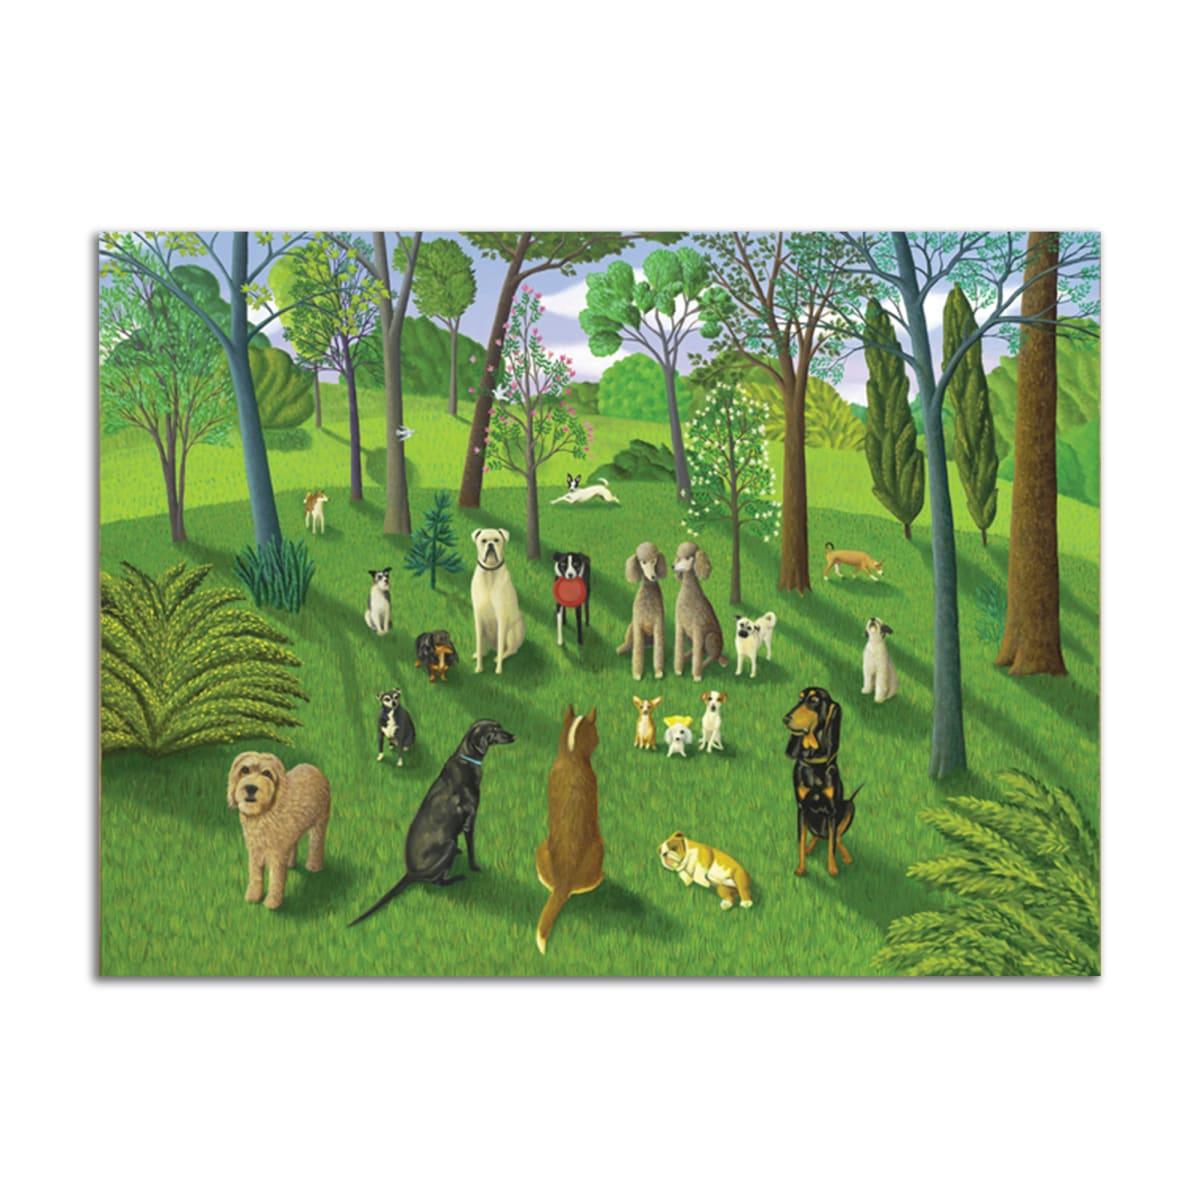 Dog Park III by Jane Troup